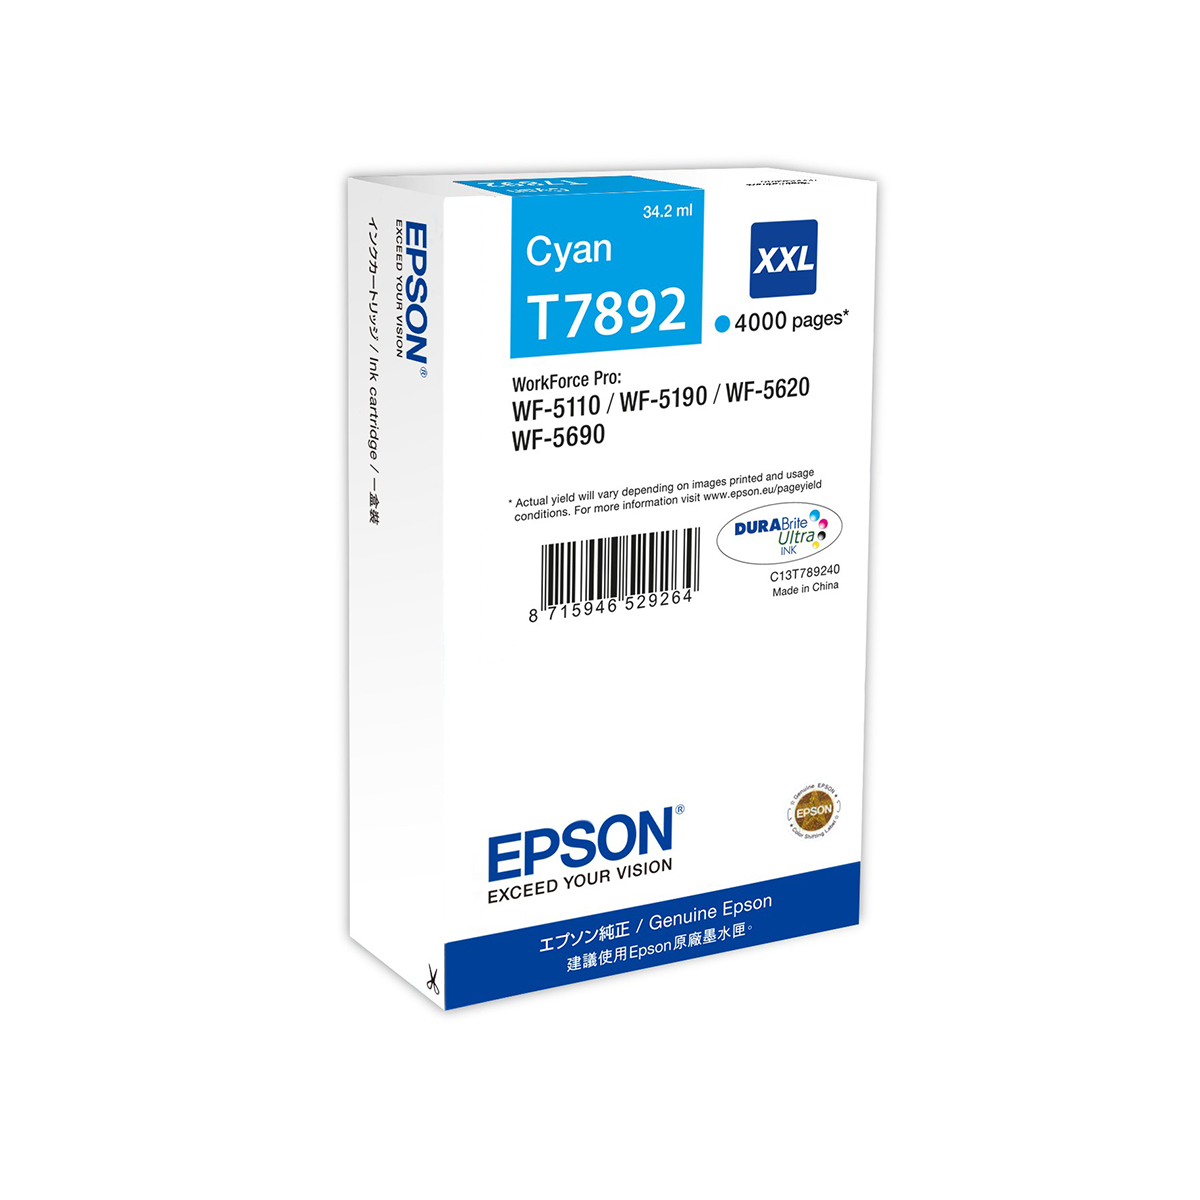 Epson T789 Ink Cartridge XXL Cyan